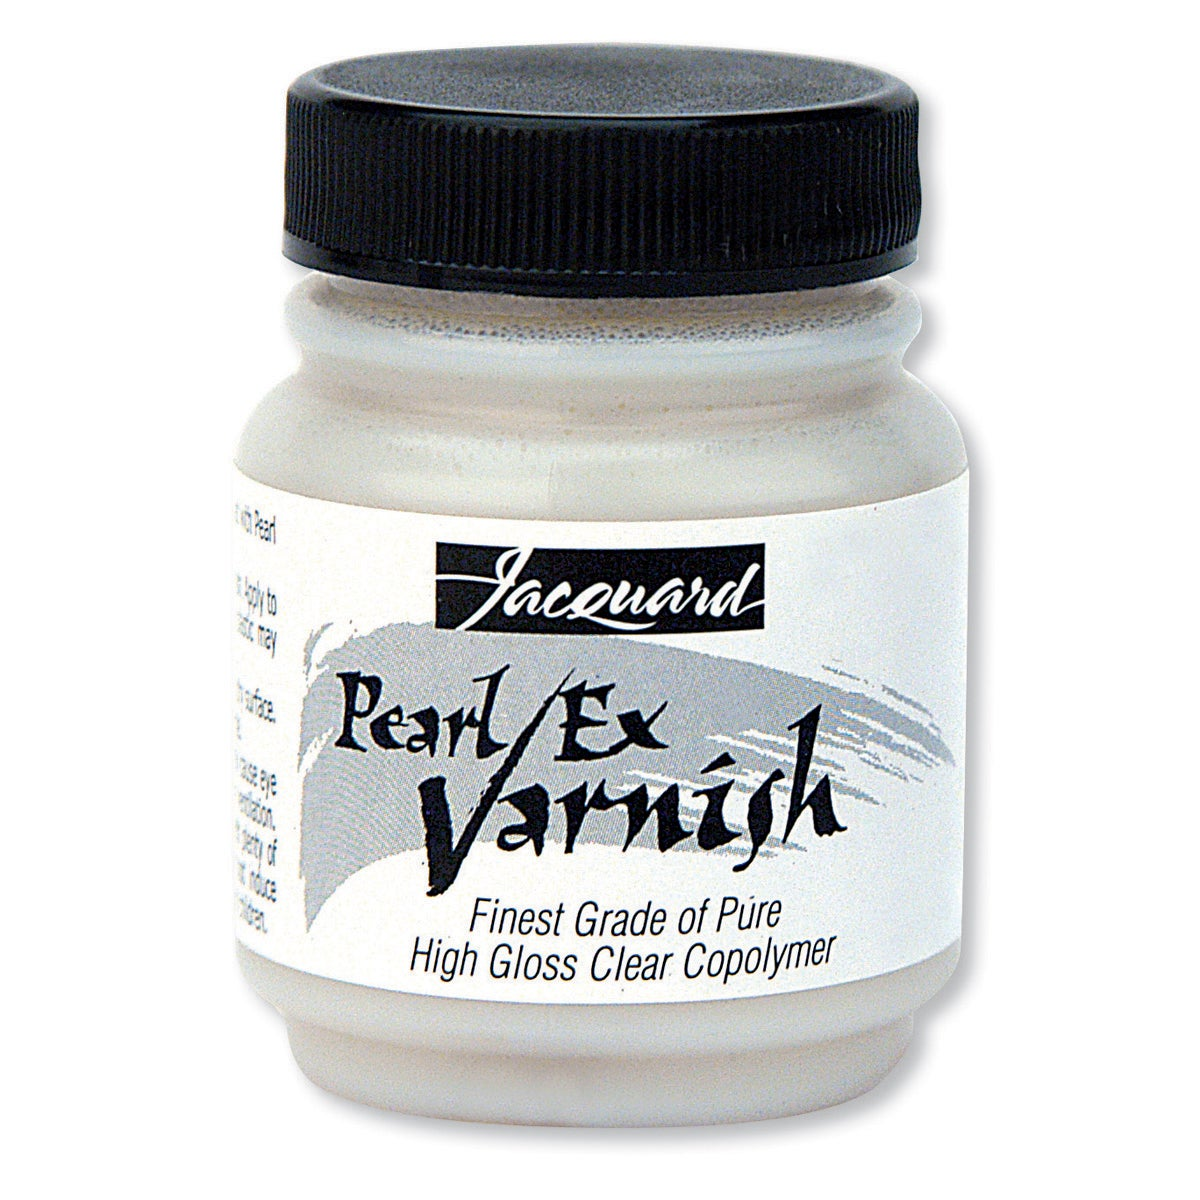 Jacquard Pearl (White) Ex Varnish 2.25oz-Clear (Clear)